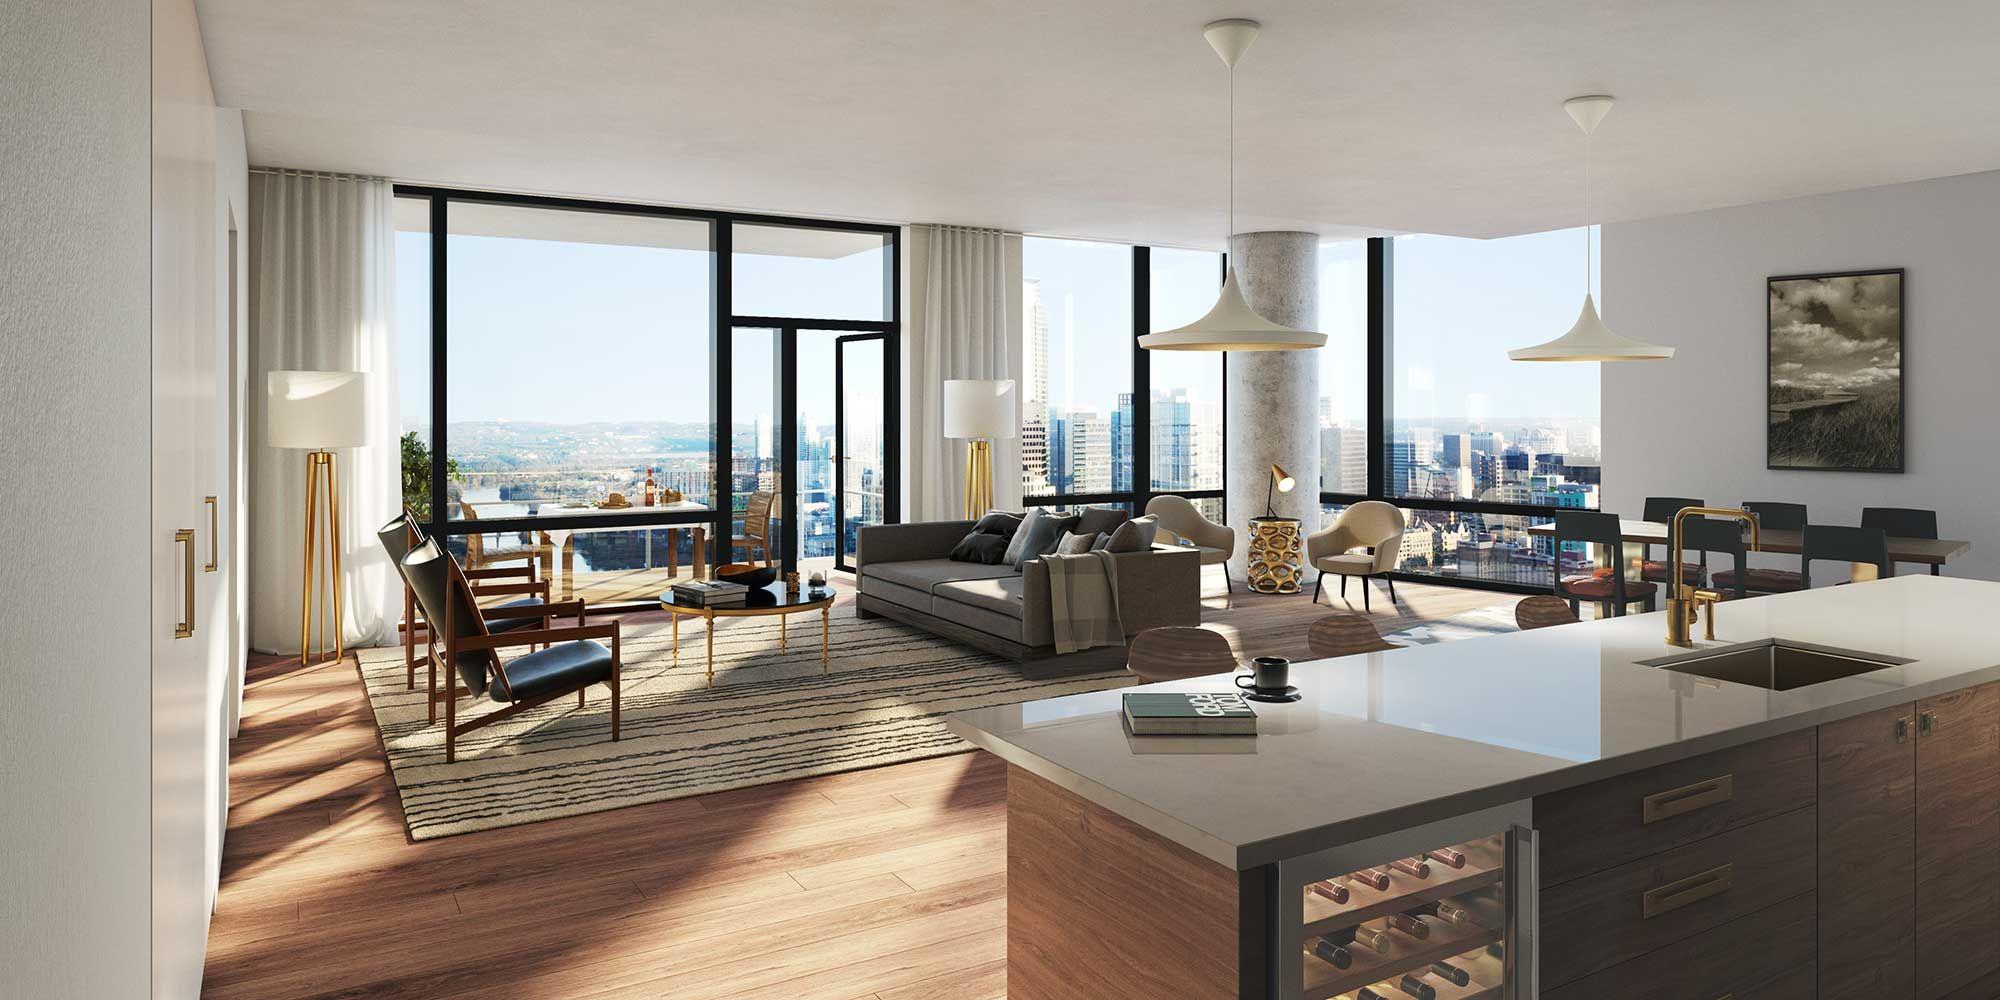 Austin Modern Luxury Condos Rendering